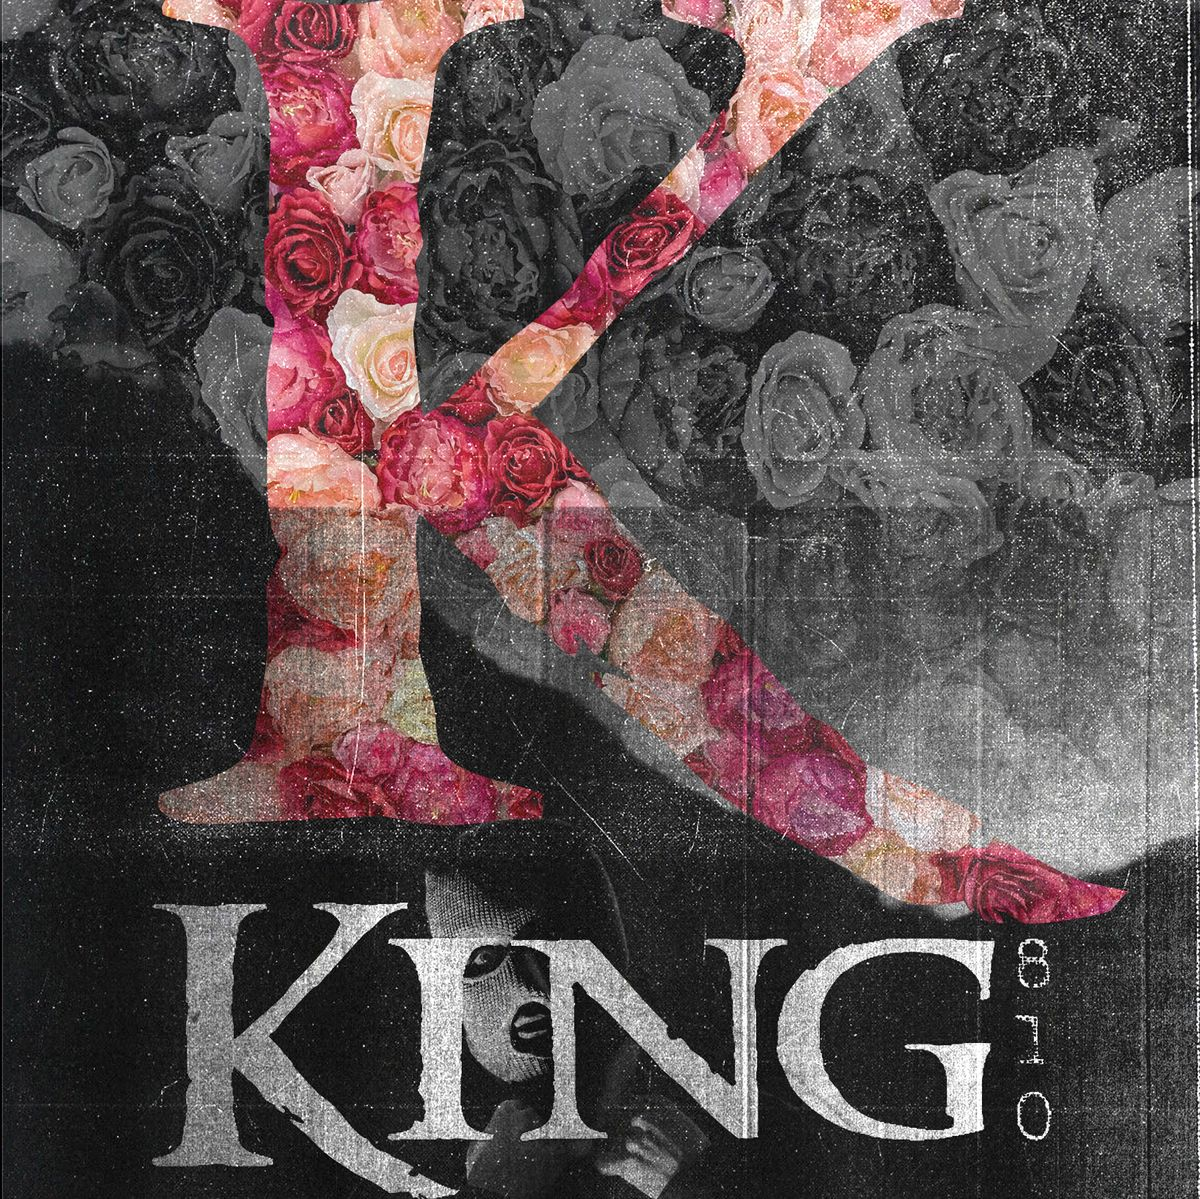 King810_AugSep2021_NoDates copy.jpg